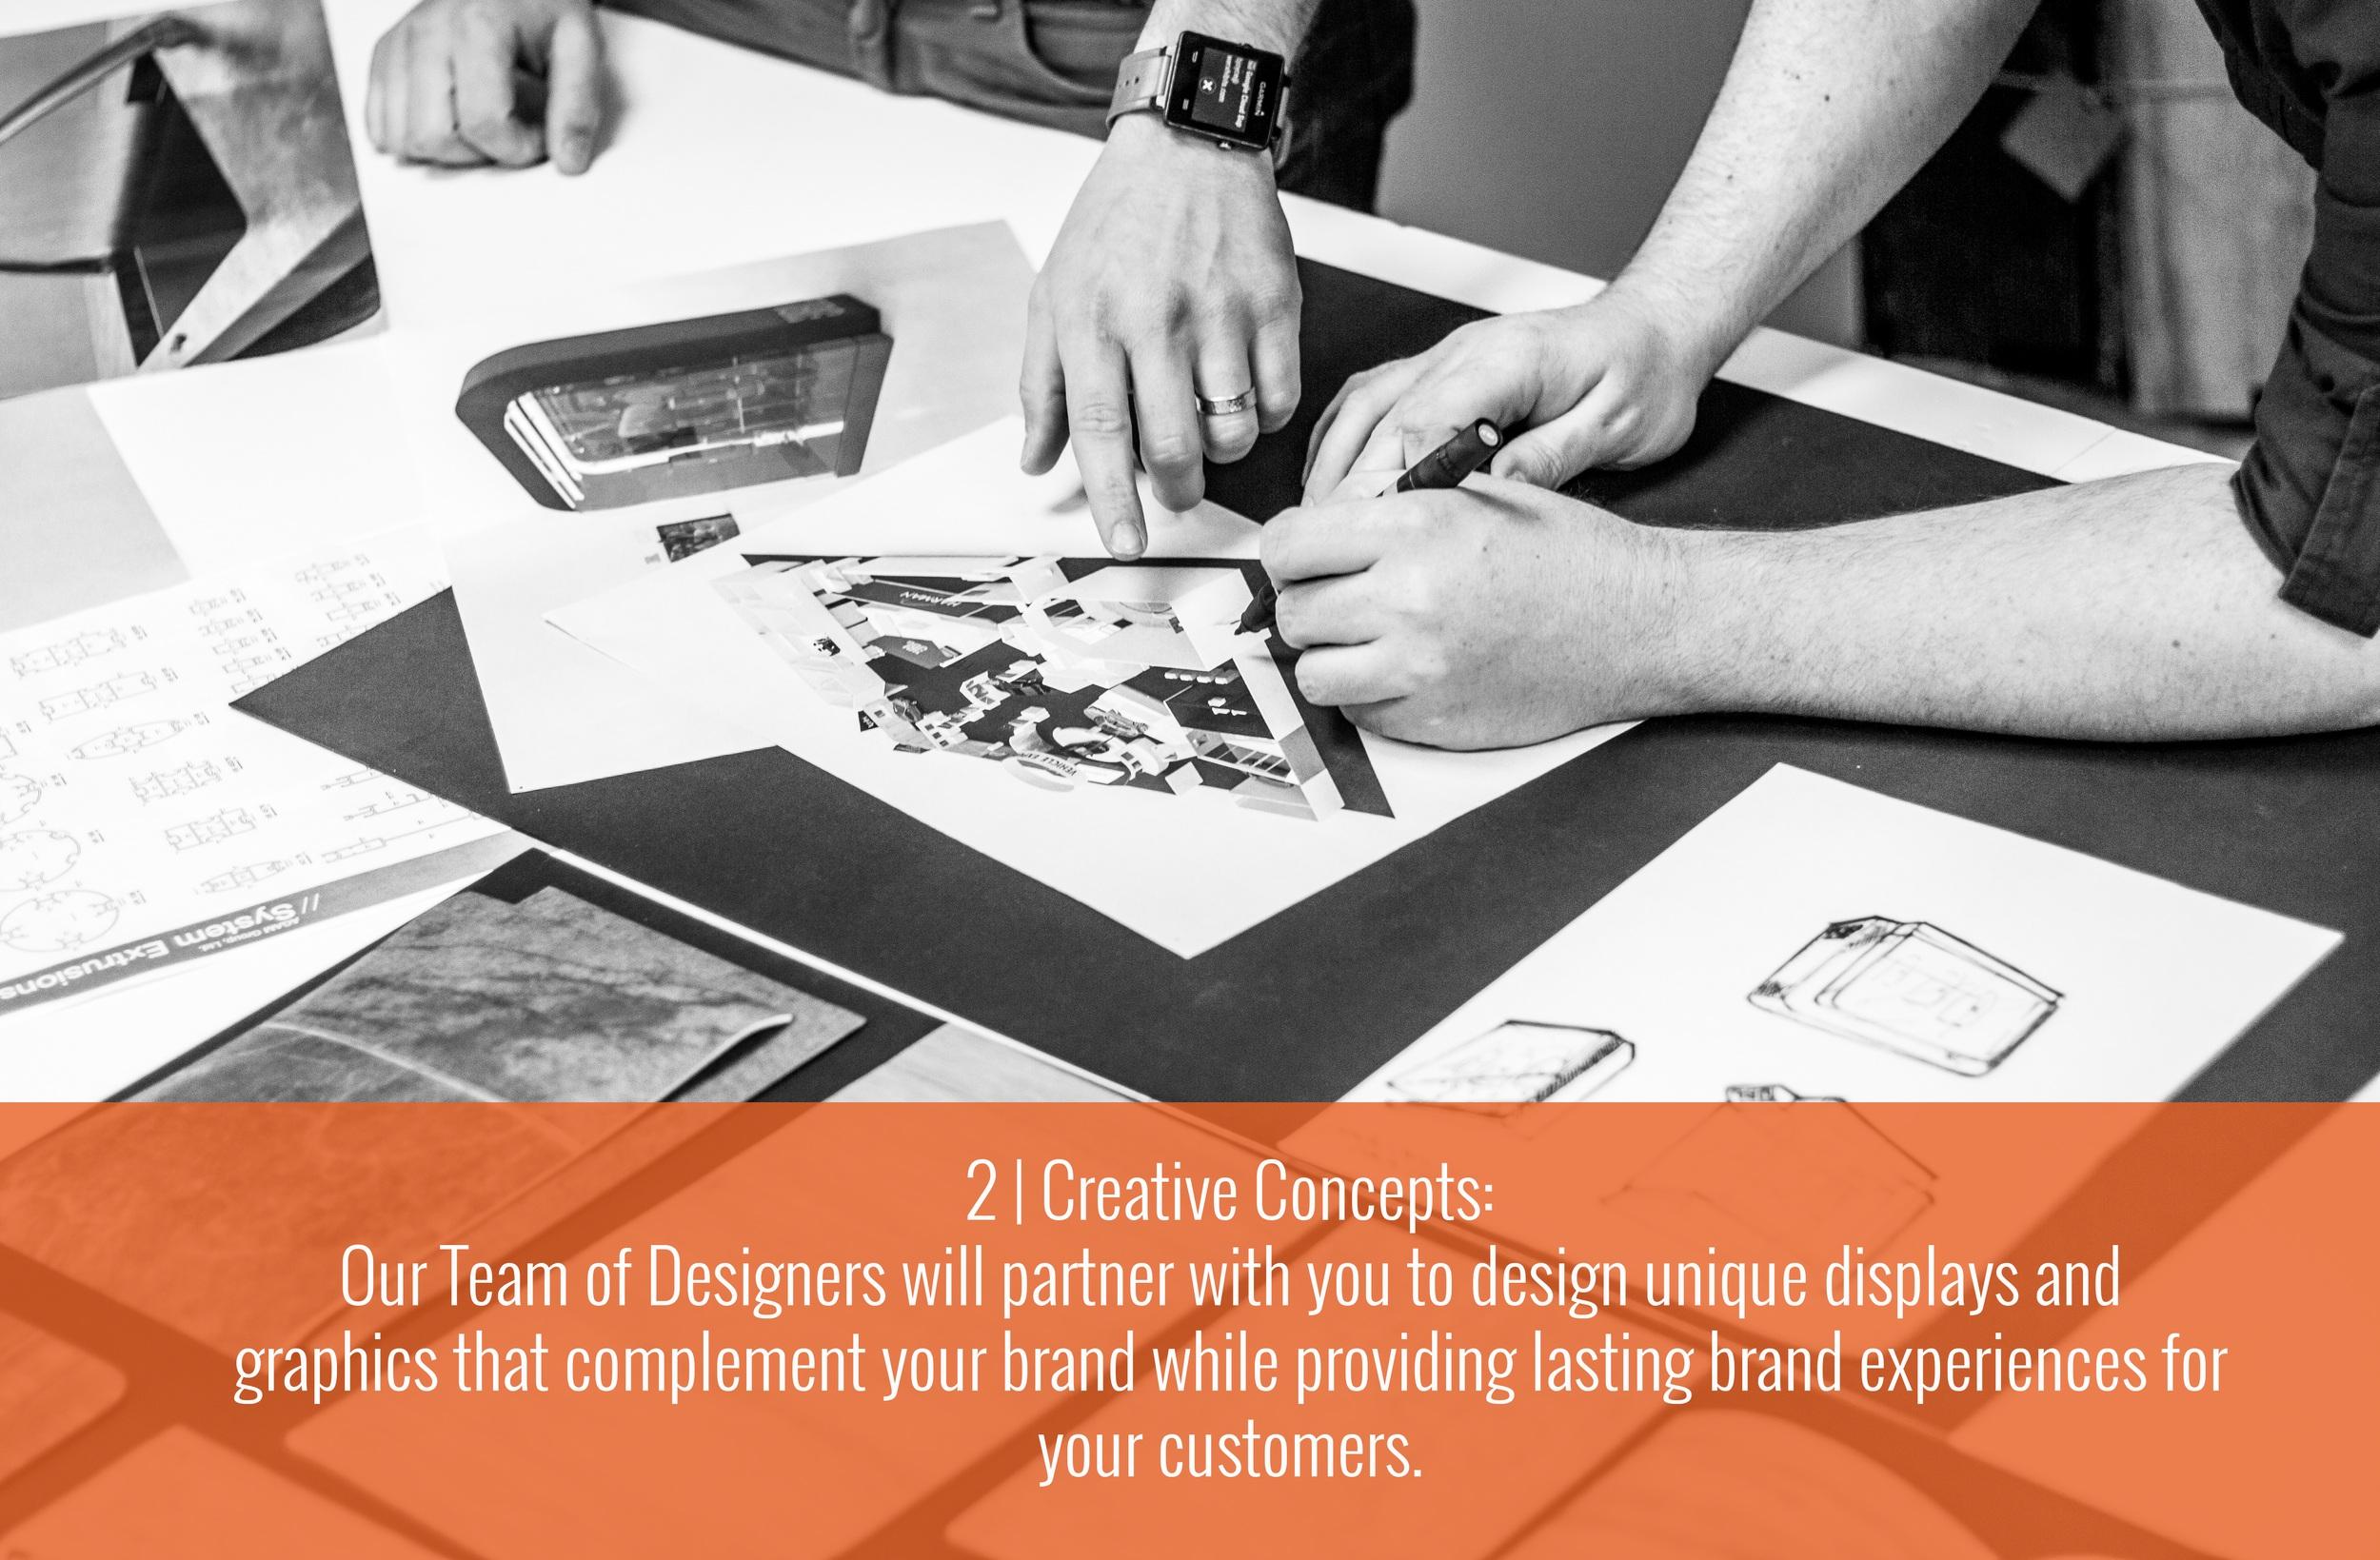 2 creative concepts 2.png